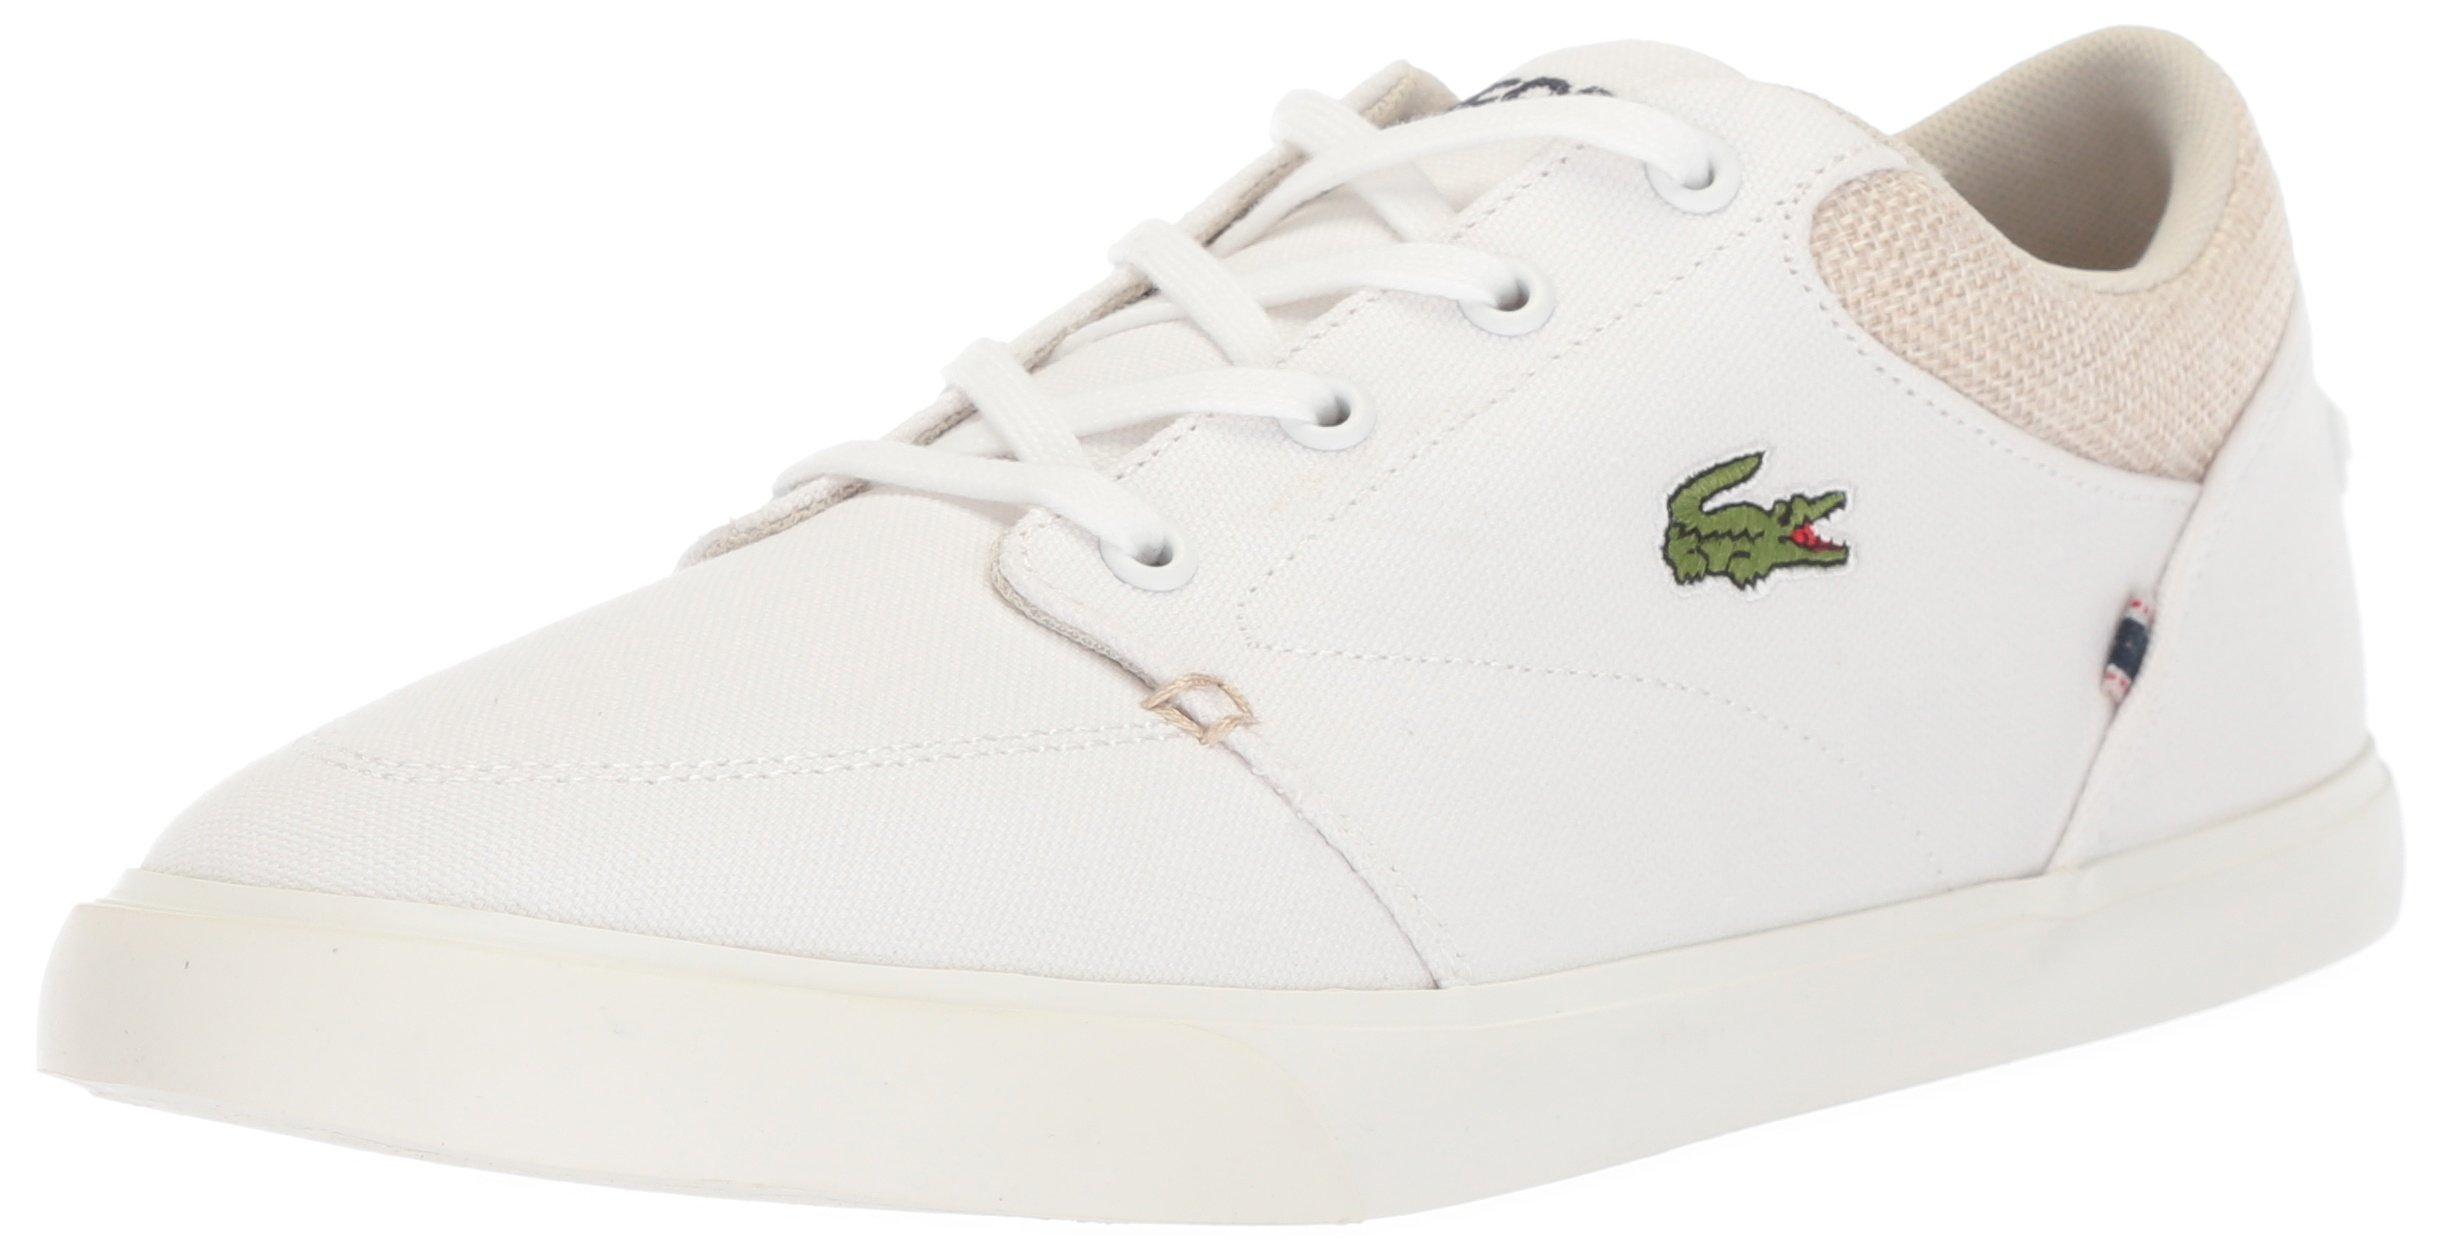 Lacoste Men's Bayliss Sneaker, White Canvas, 8 M US